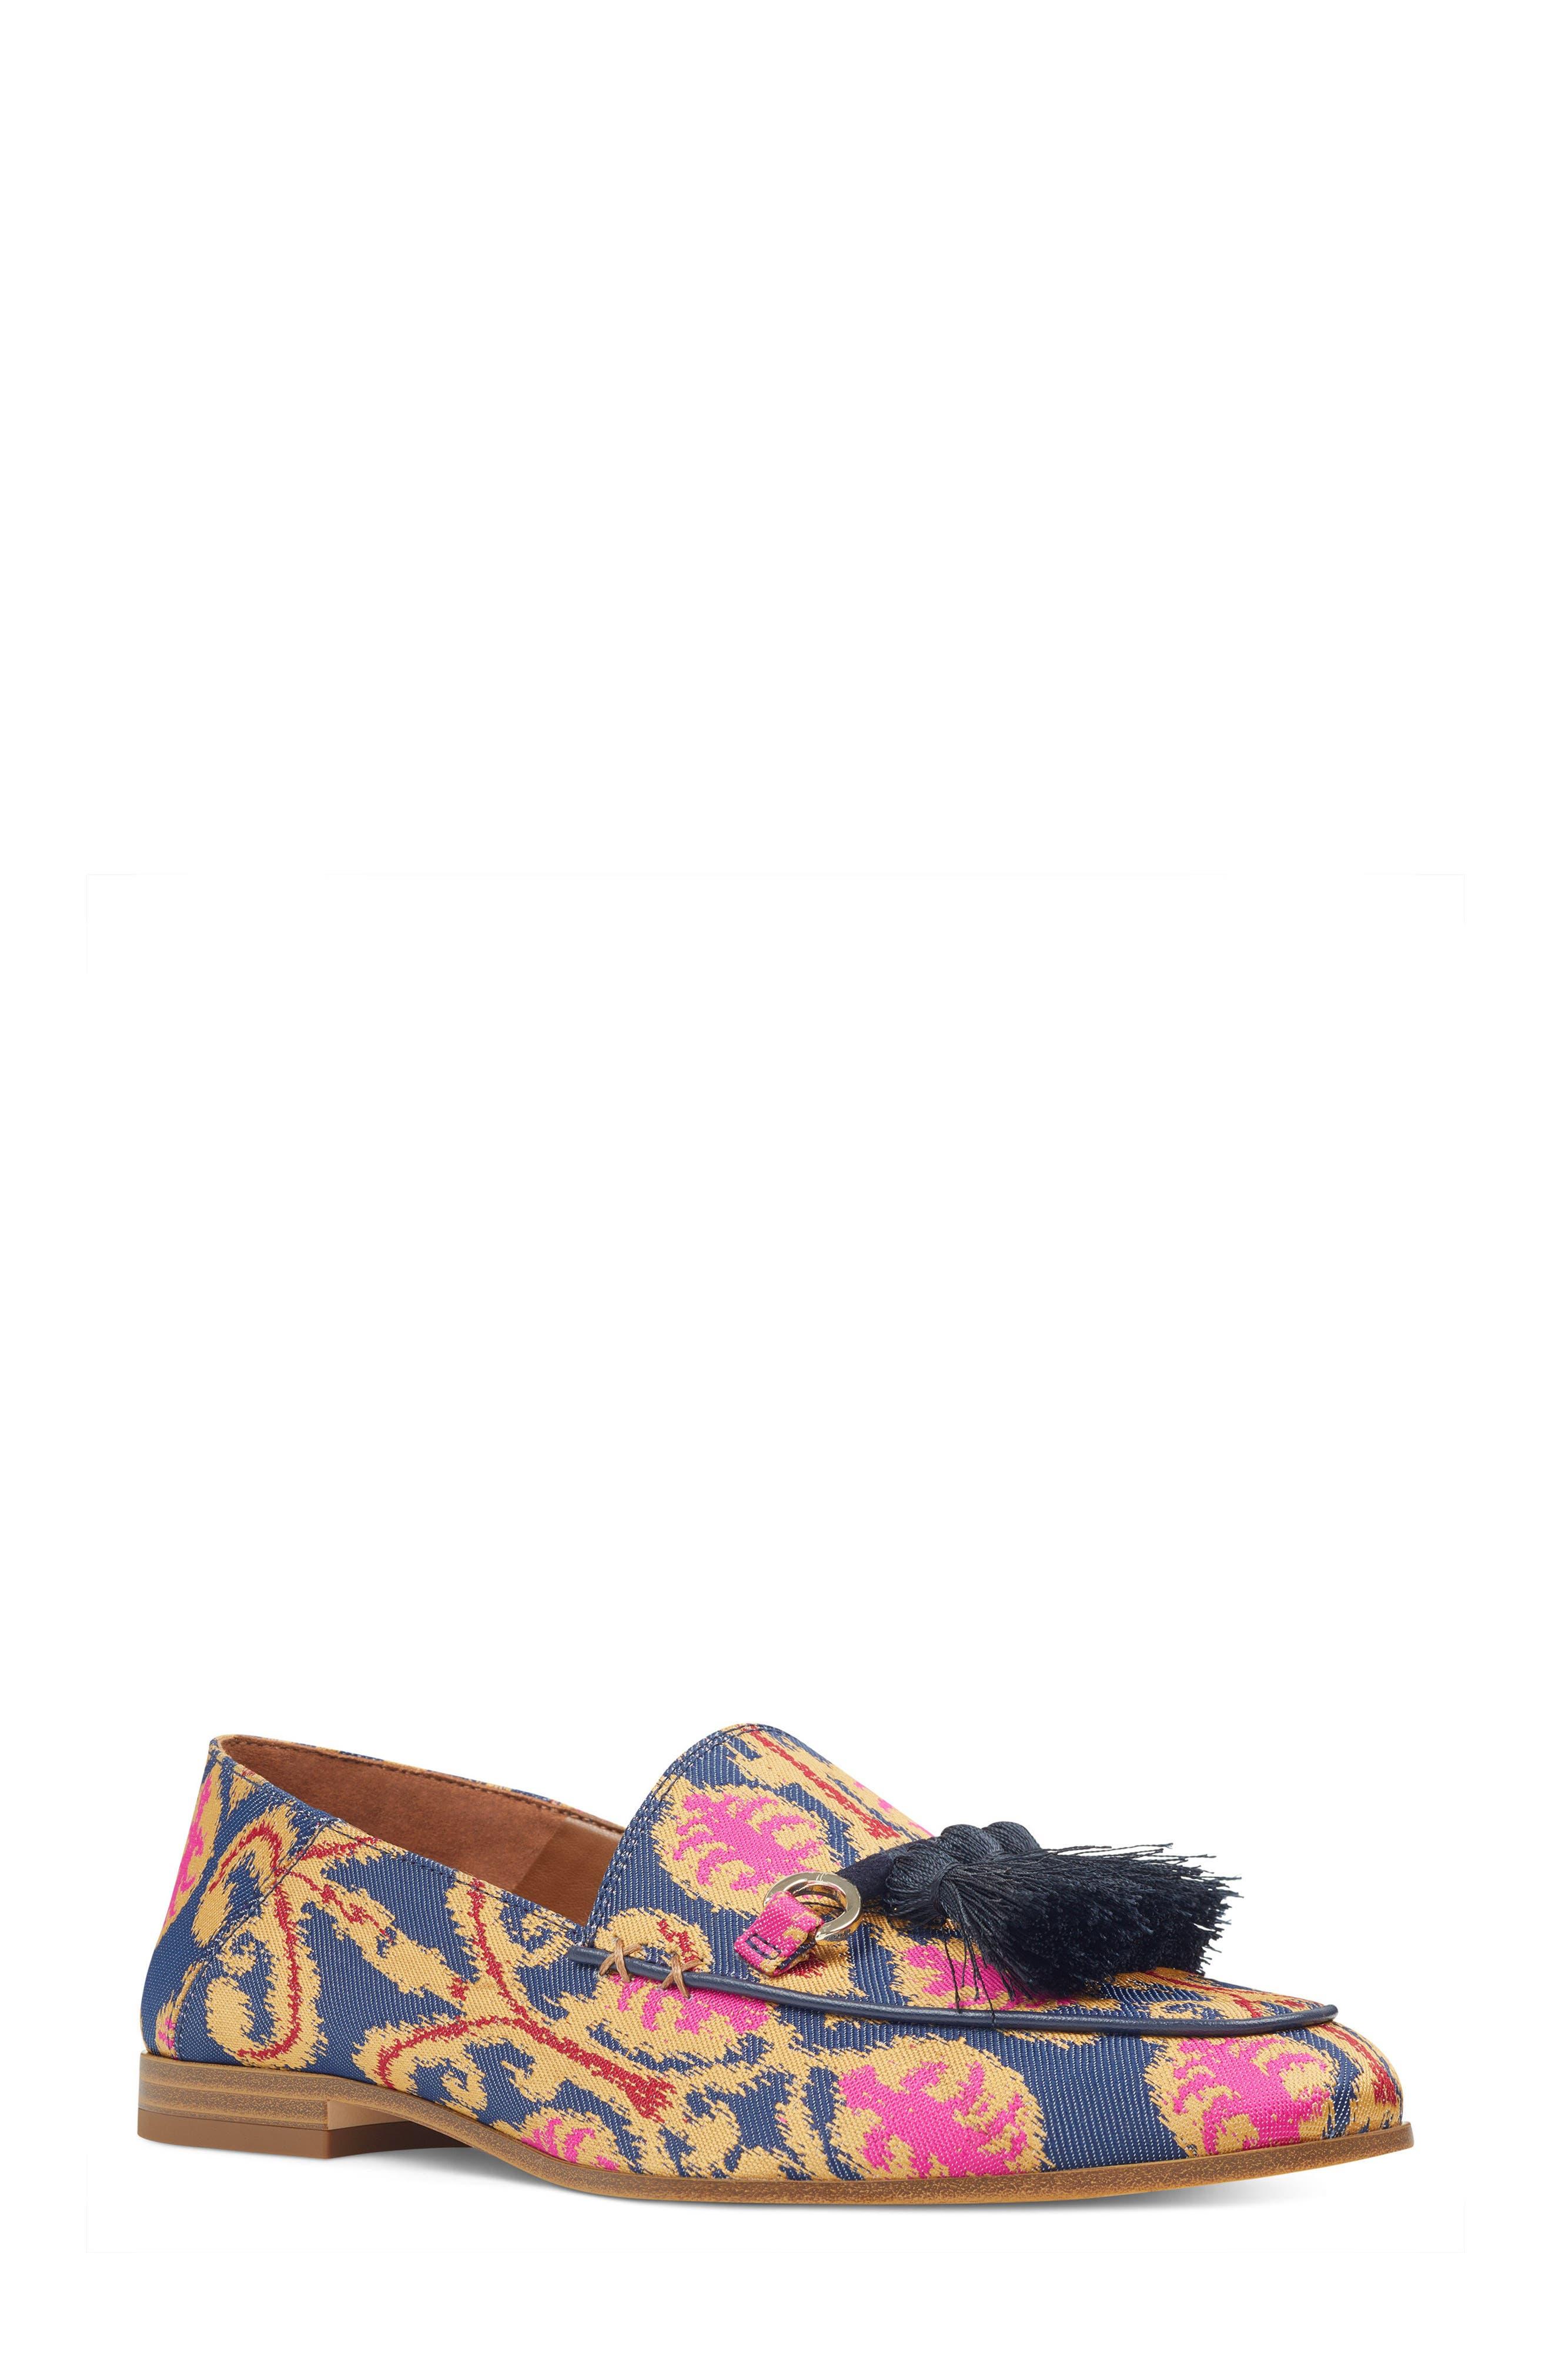 Weslir Tassel Loafer,                         Main,                         color, Blue Multi Fabric